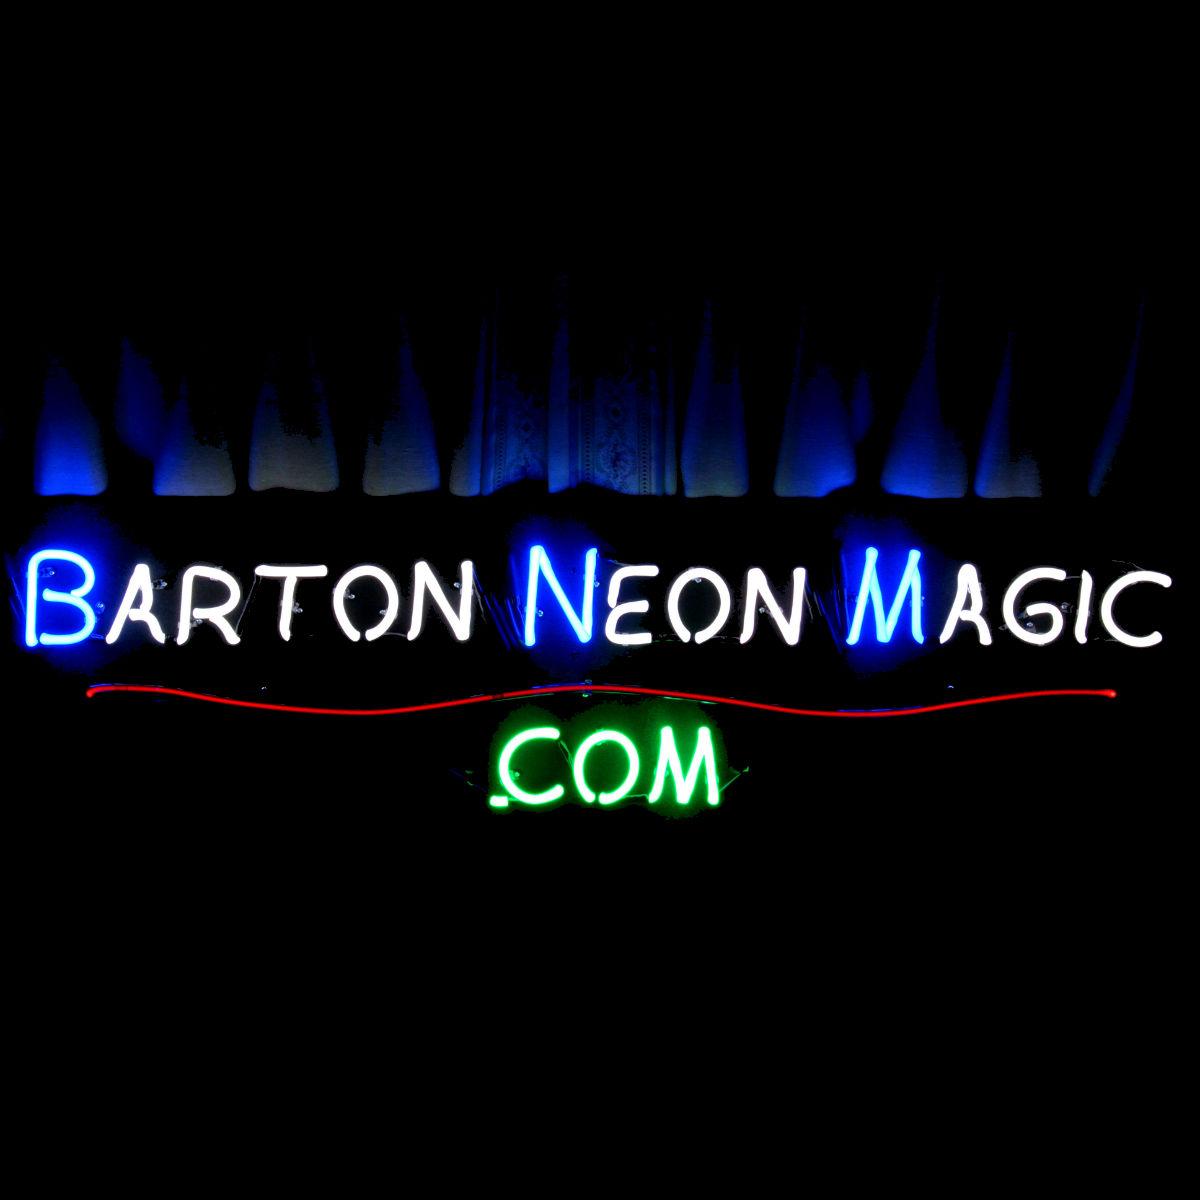 Designer Custom Neon Art and Light Sculptures by John Barton - BartonNeonMagic.com